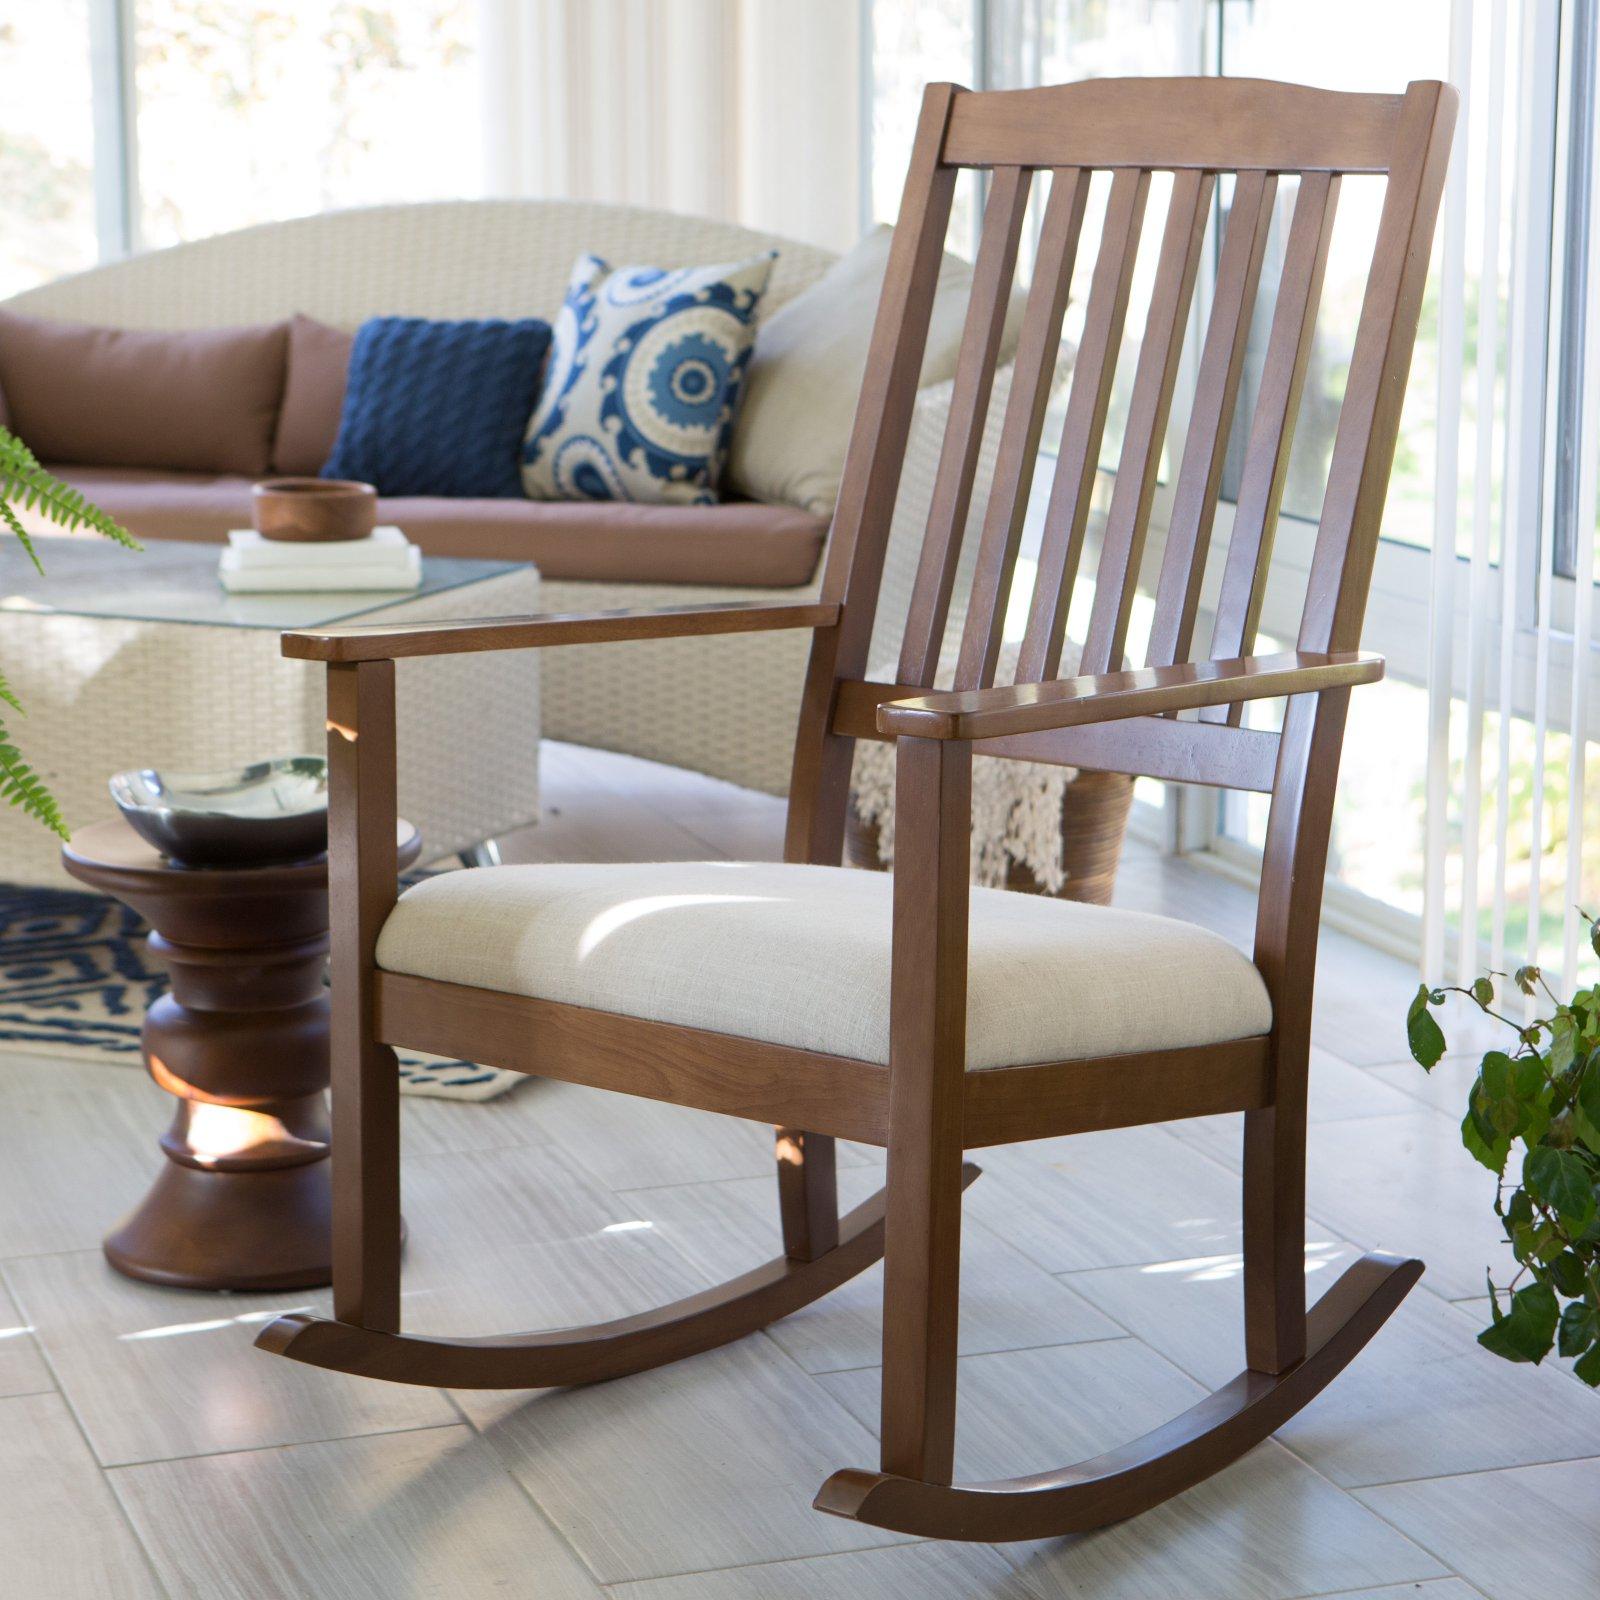 Belham Living Upholstered Mission Wood Nursery Rocker - Weathered Espresso